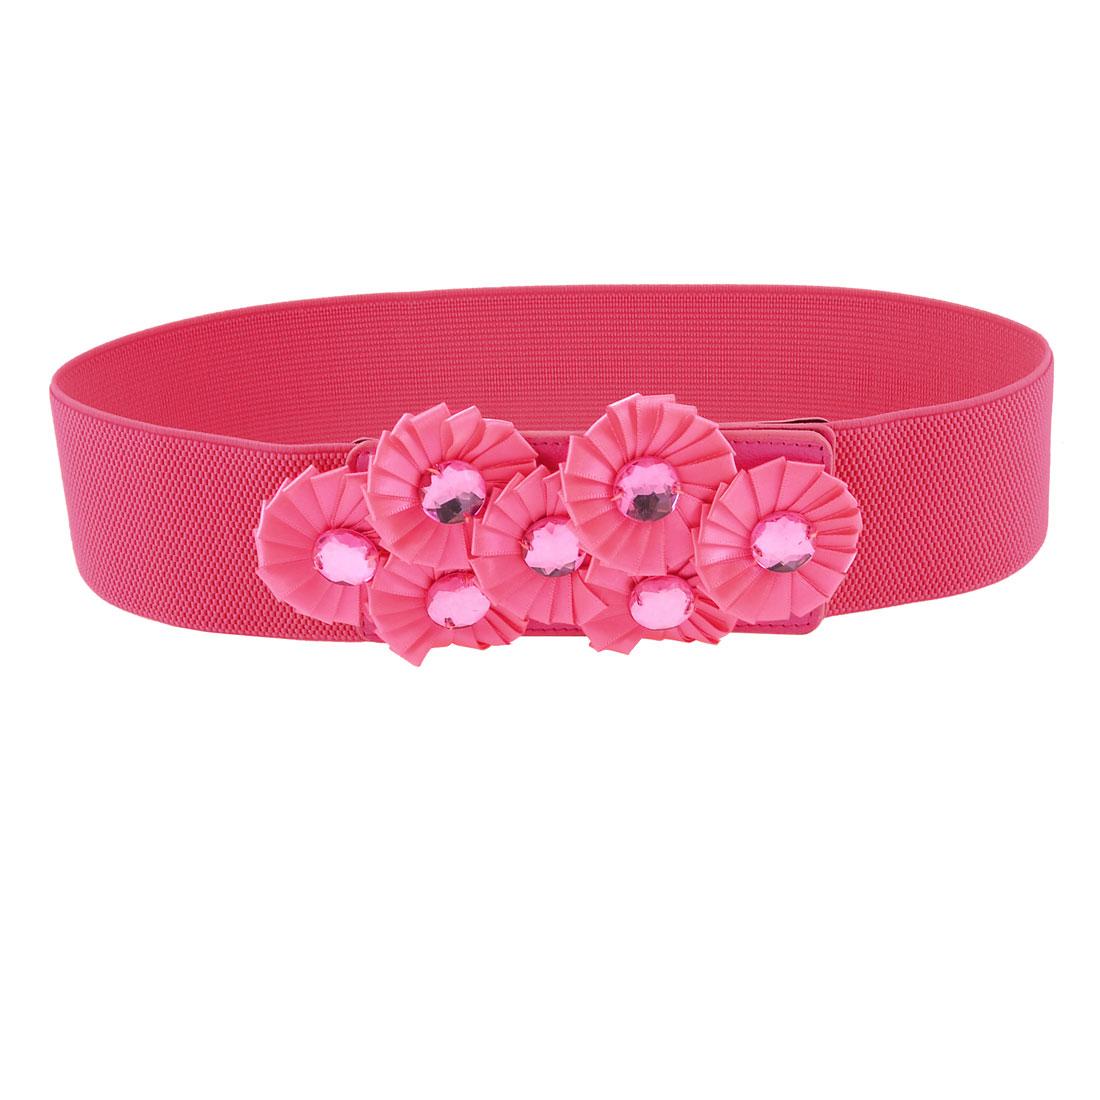 Ladies Hot Pink Florals Accent Elastic Waist Belt Textured Waistband 6CM Wide